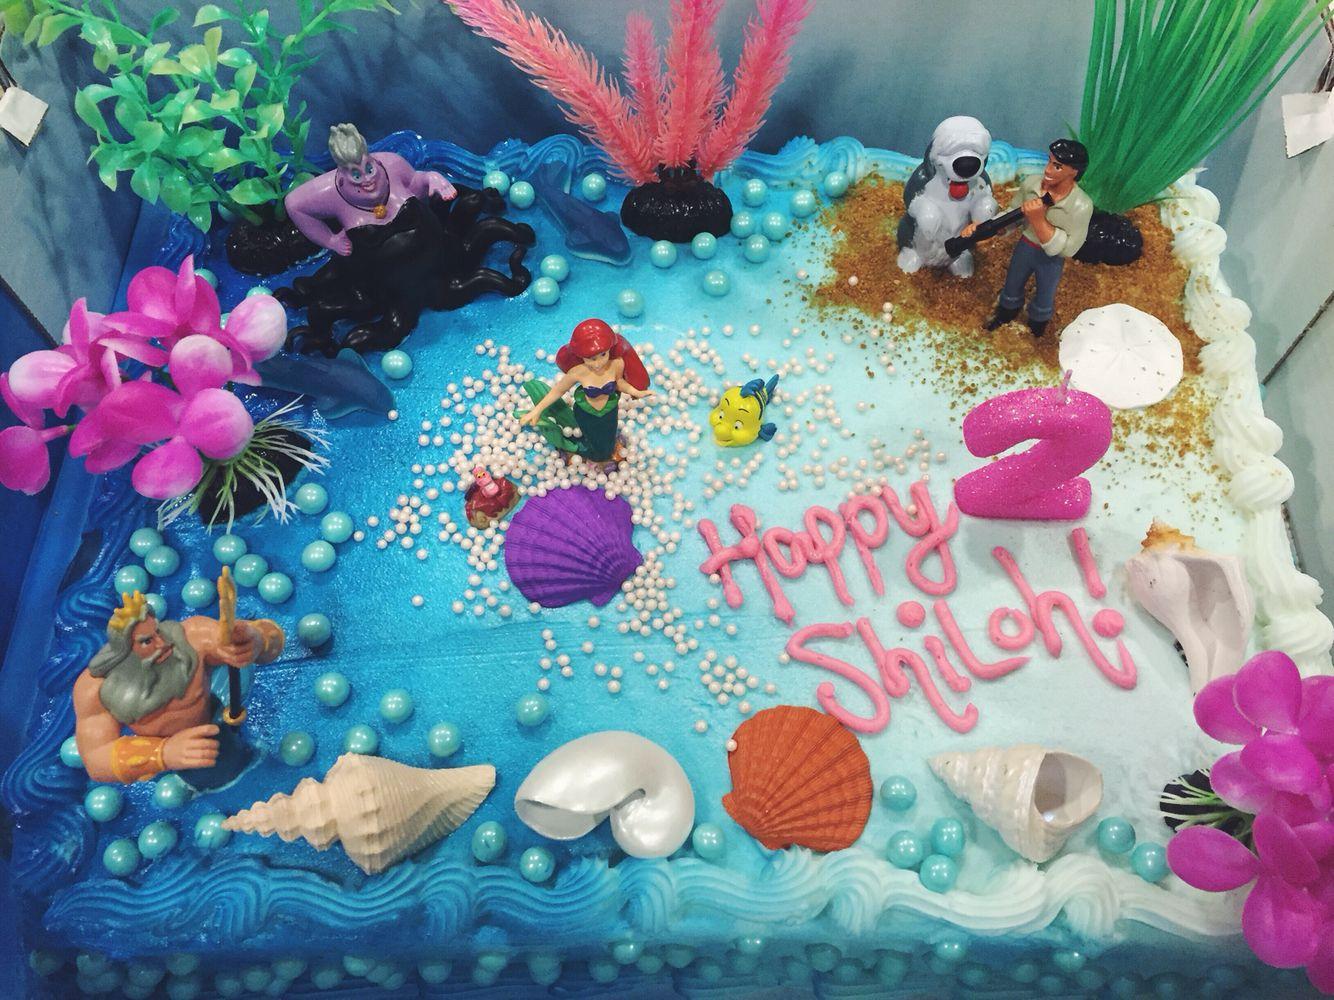 Costco Plain White Iced Cake Turned Magical Little Mermaid Oasis 2nd Birthday Cake Mermaid